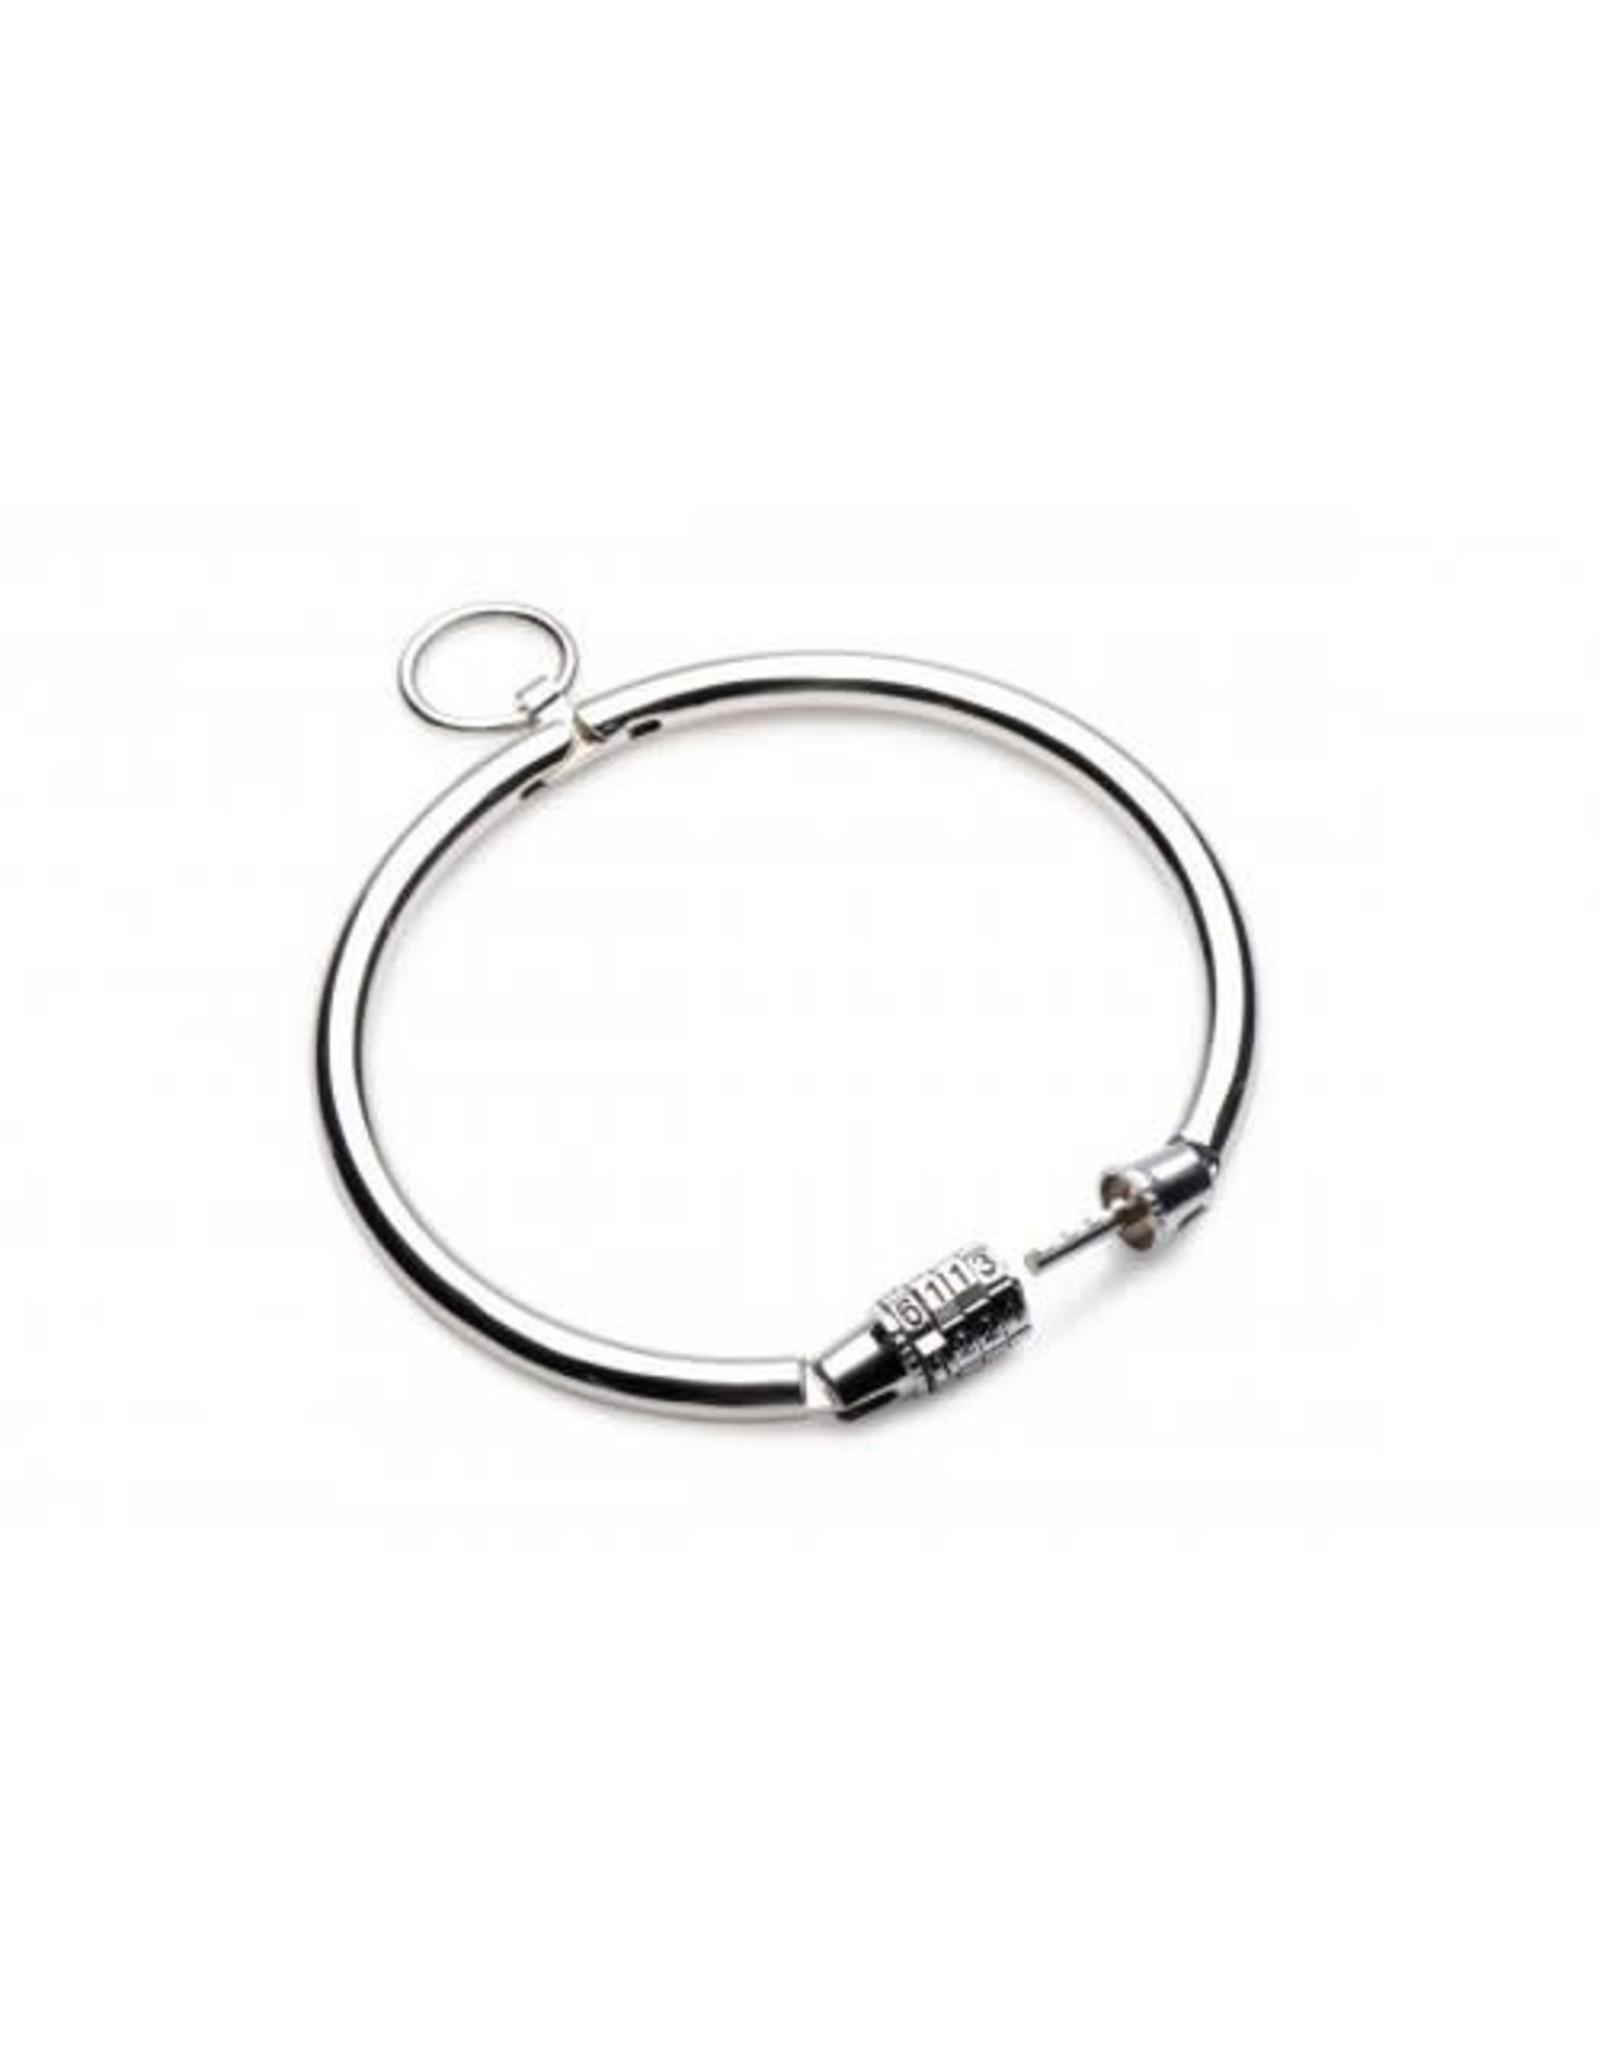 Master Series Master Series Stainless Combo Lock Slave Collar